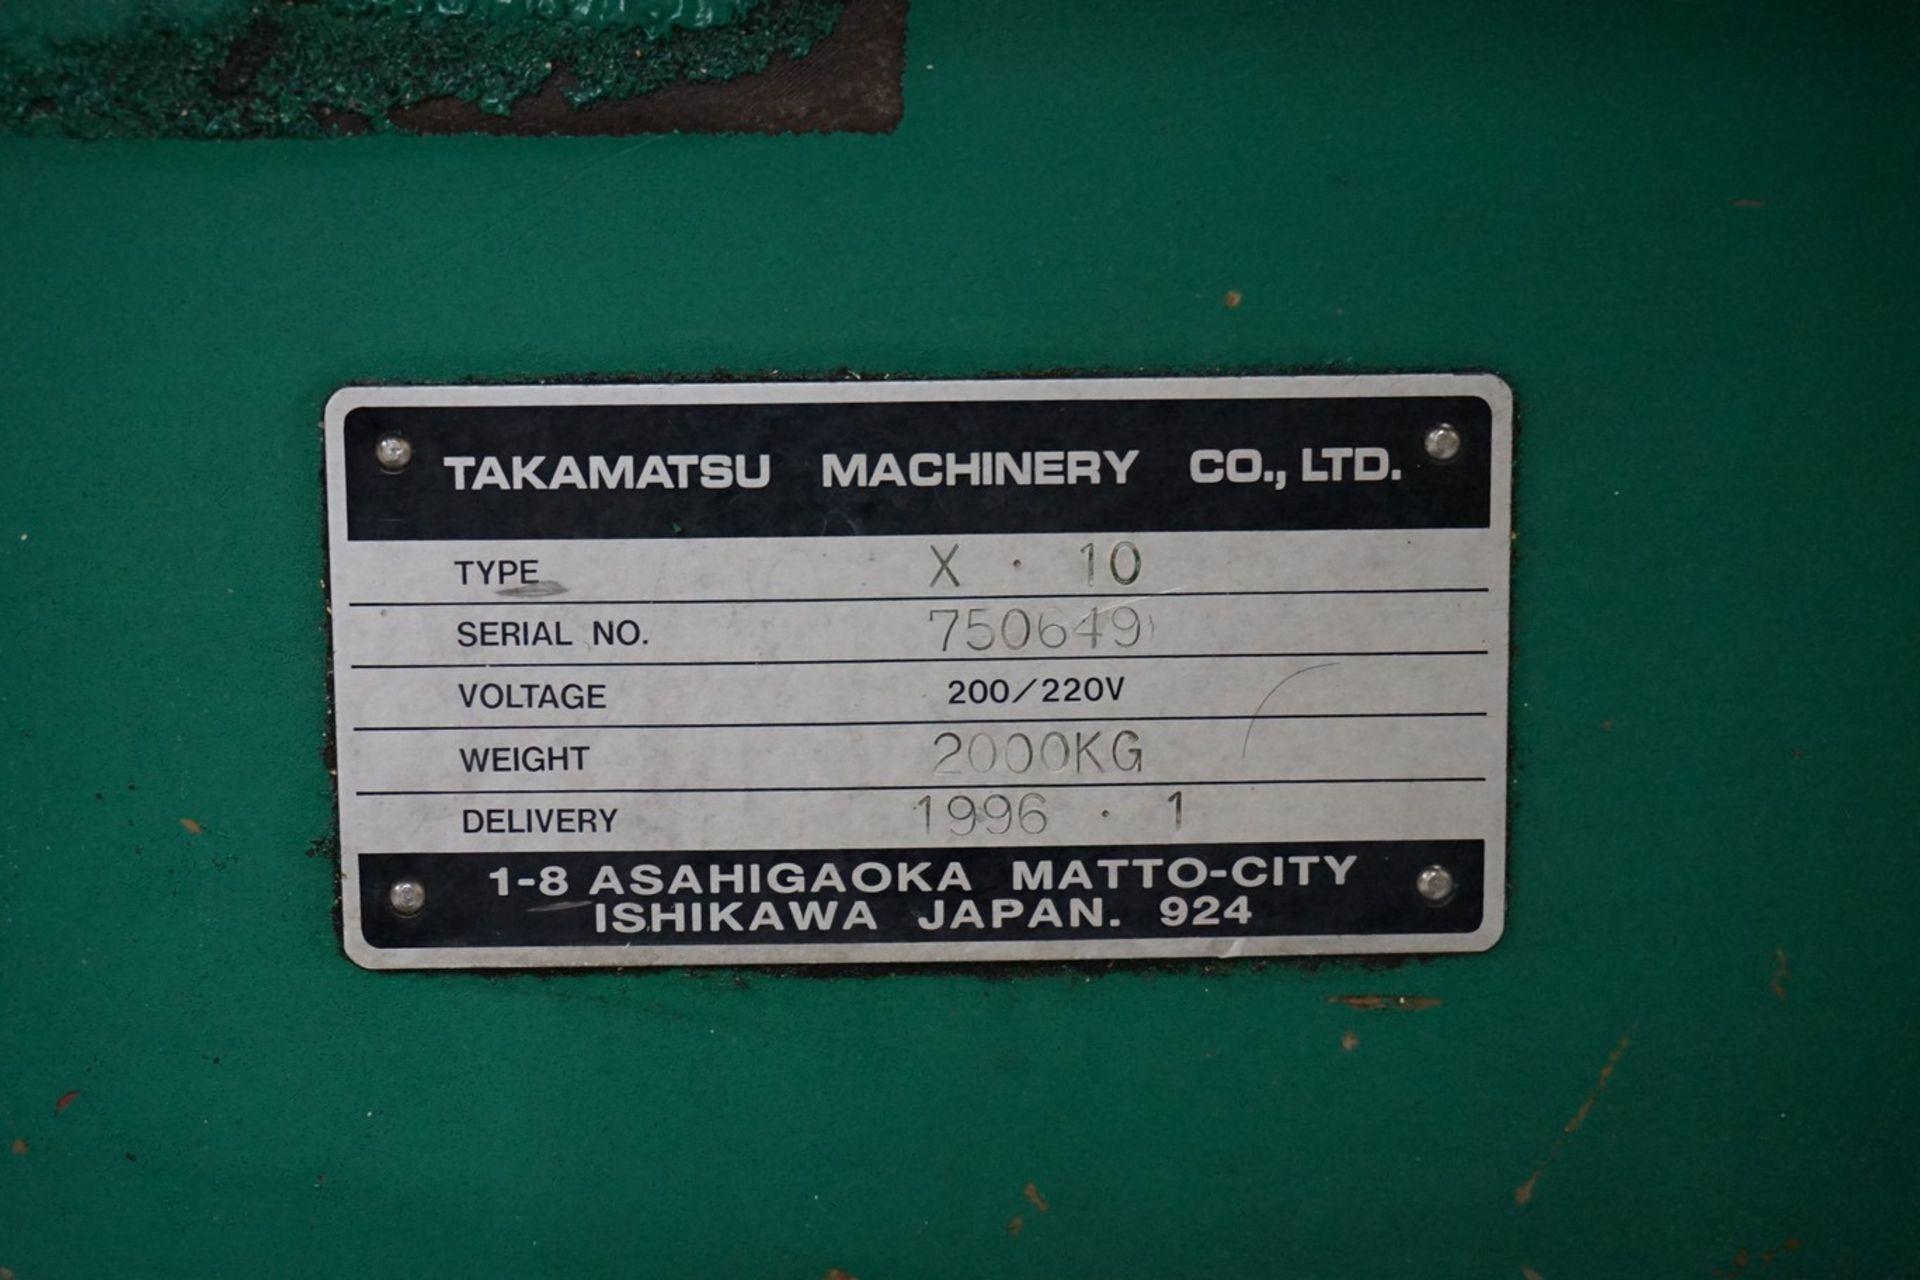 Takamatsu Model X10 CNC Lathe 200/220V c/w Chip Conveyor, Transformer - Image 4 of 6